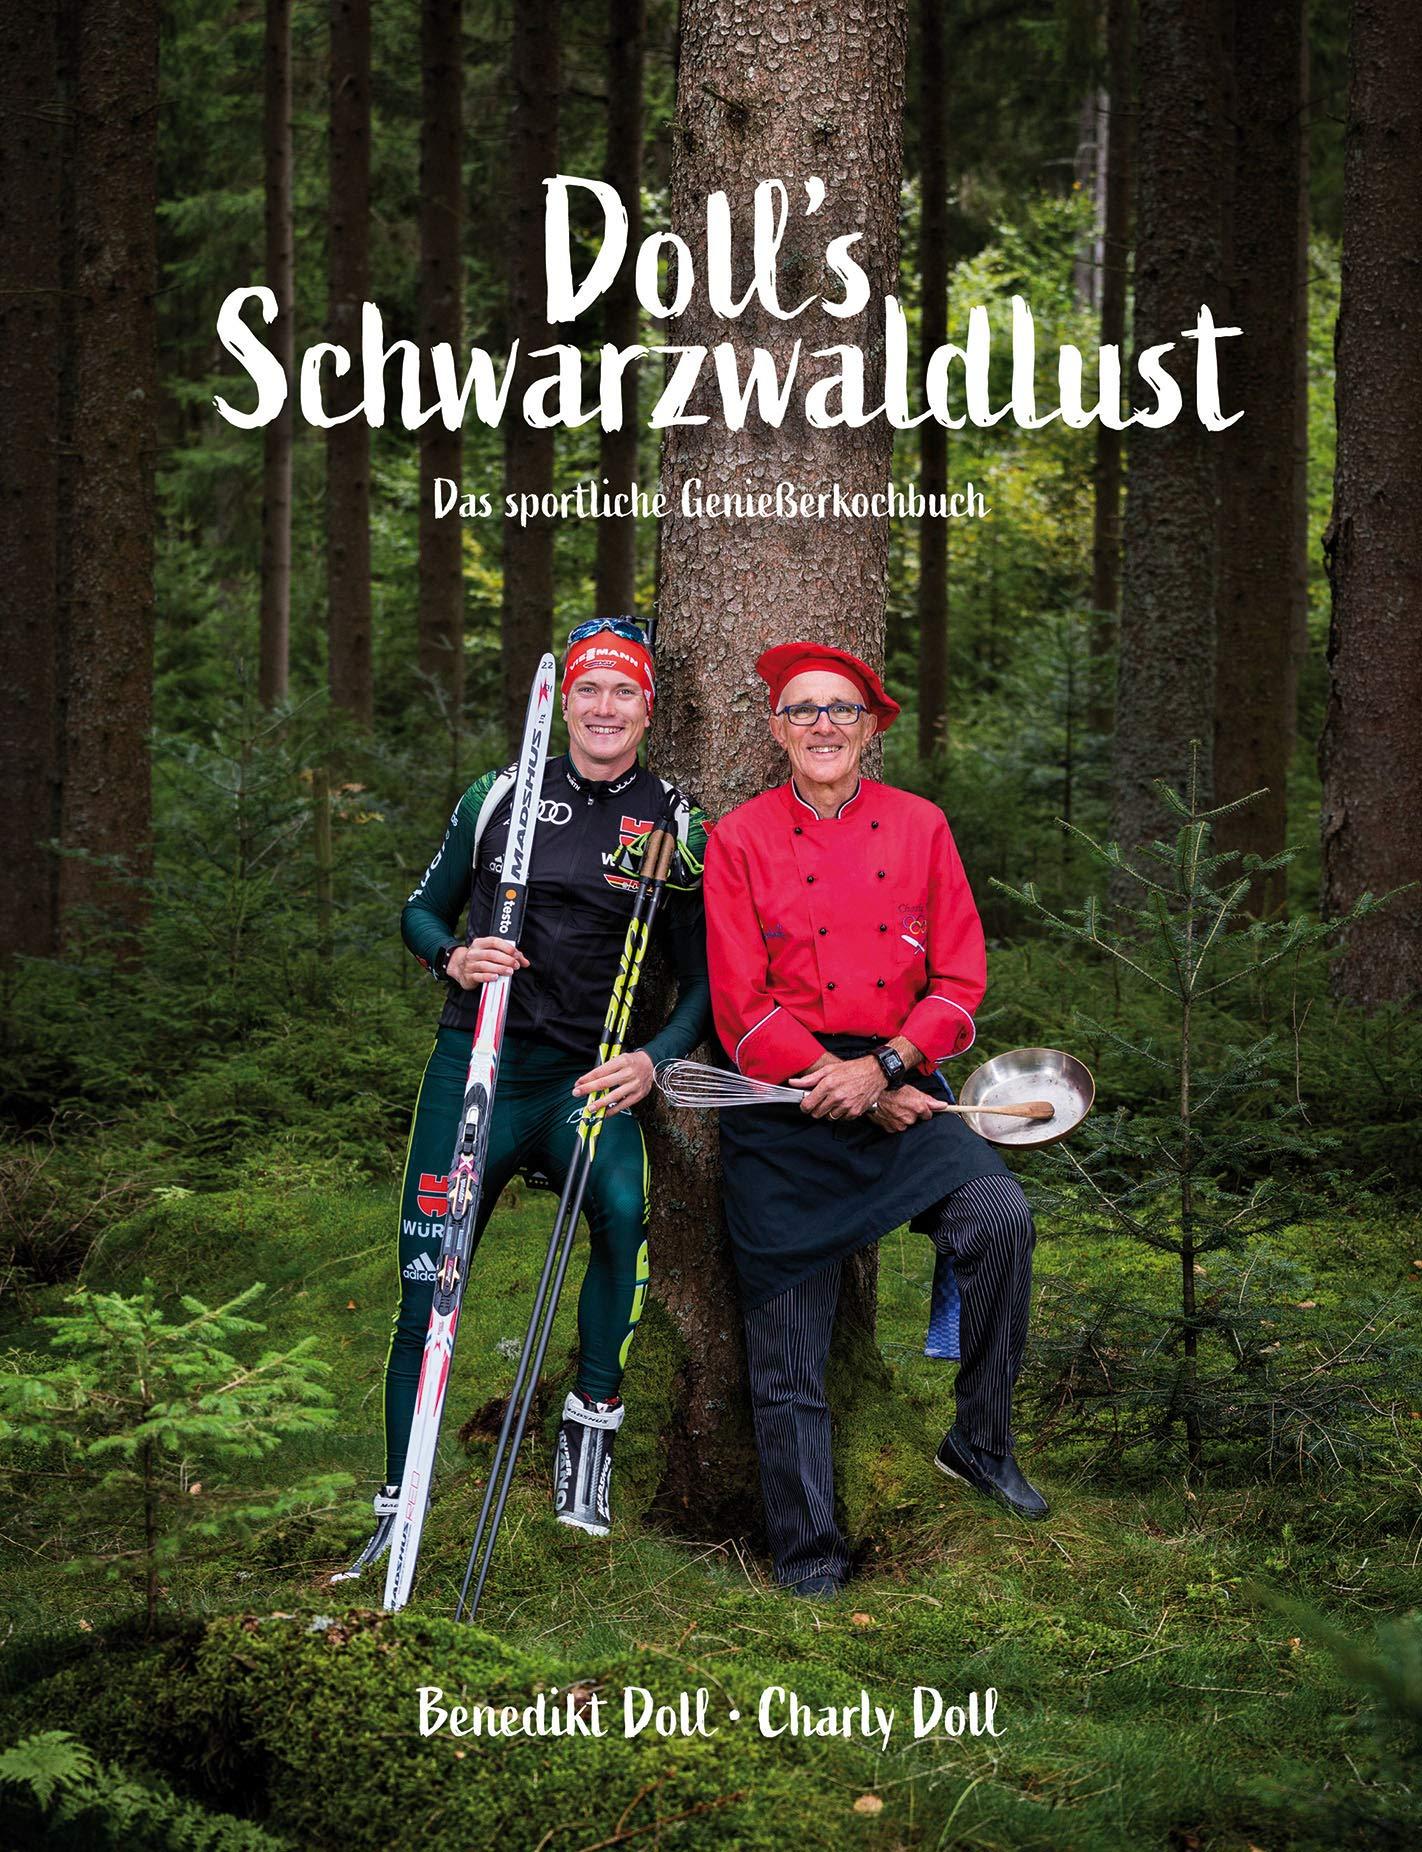 Doll S Schwarzwaldlust Das Sportliche Geniesserkochbuch Amazon Fr Benedikt Doll Charly Doll Livres Anglais Et Etrangers